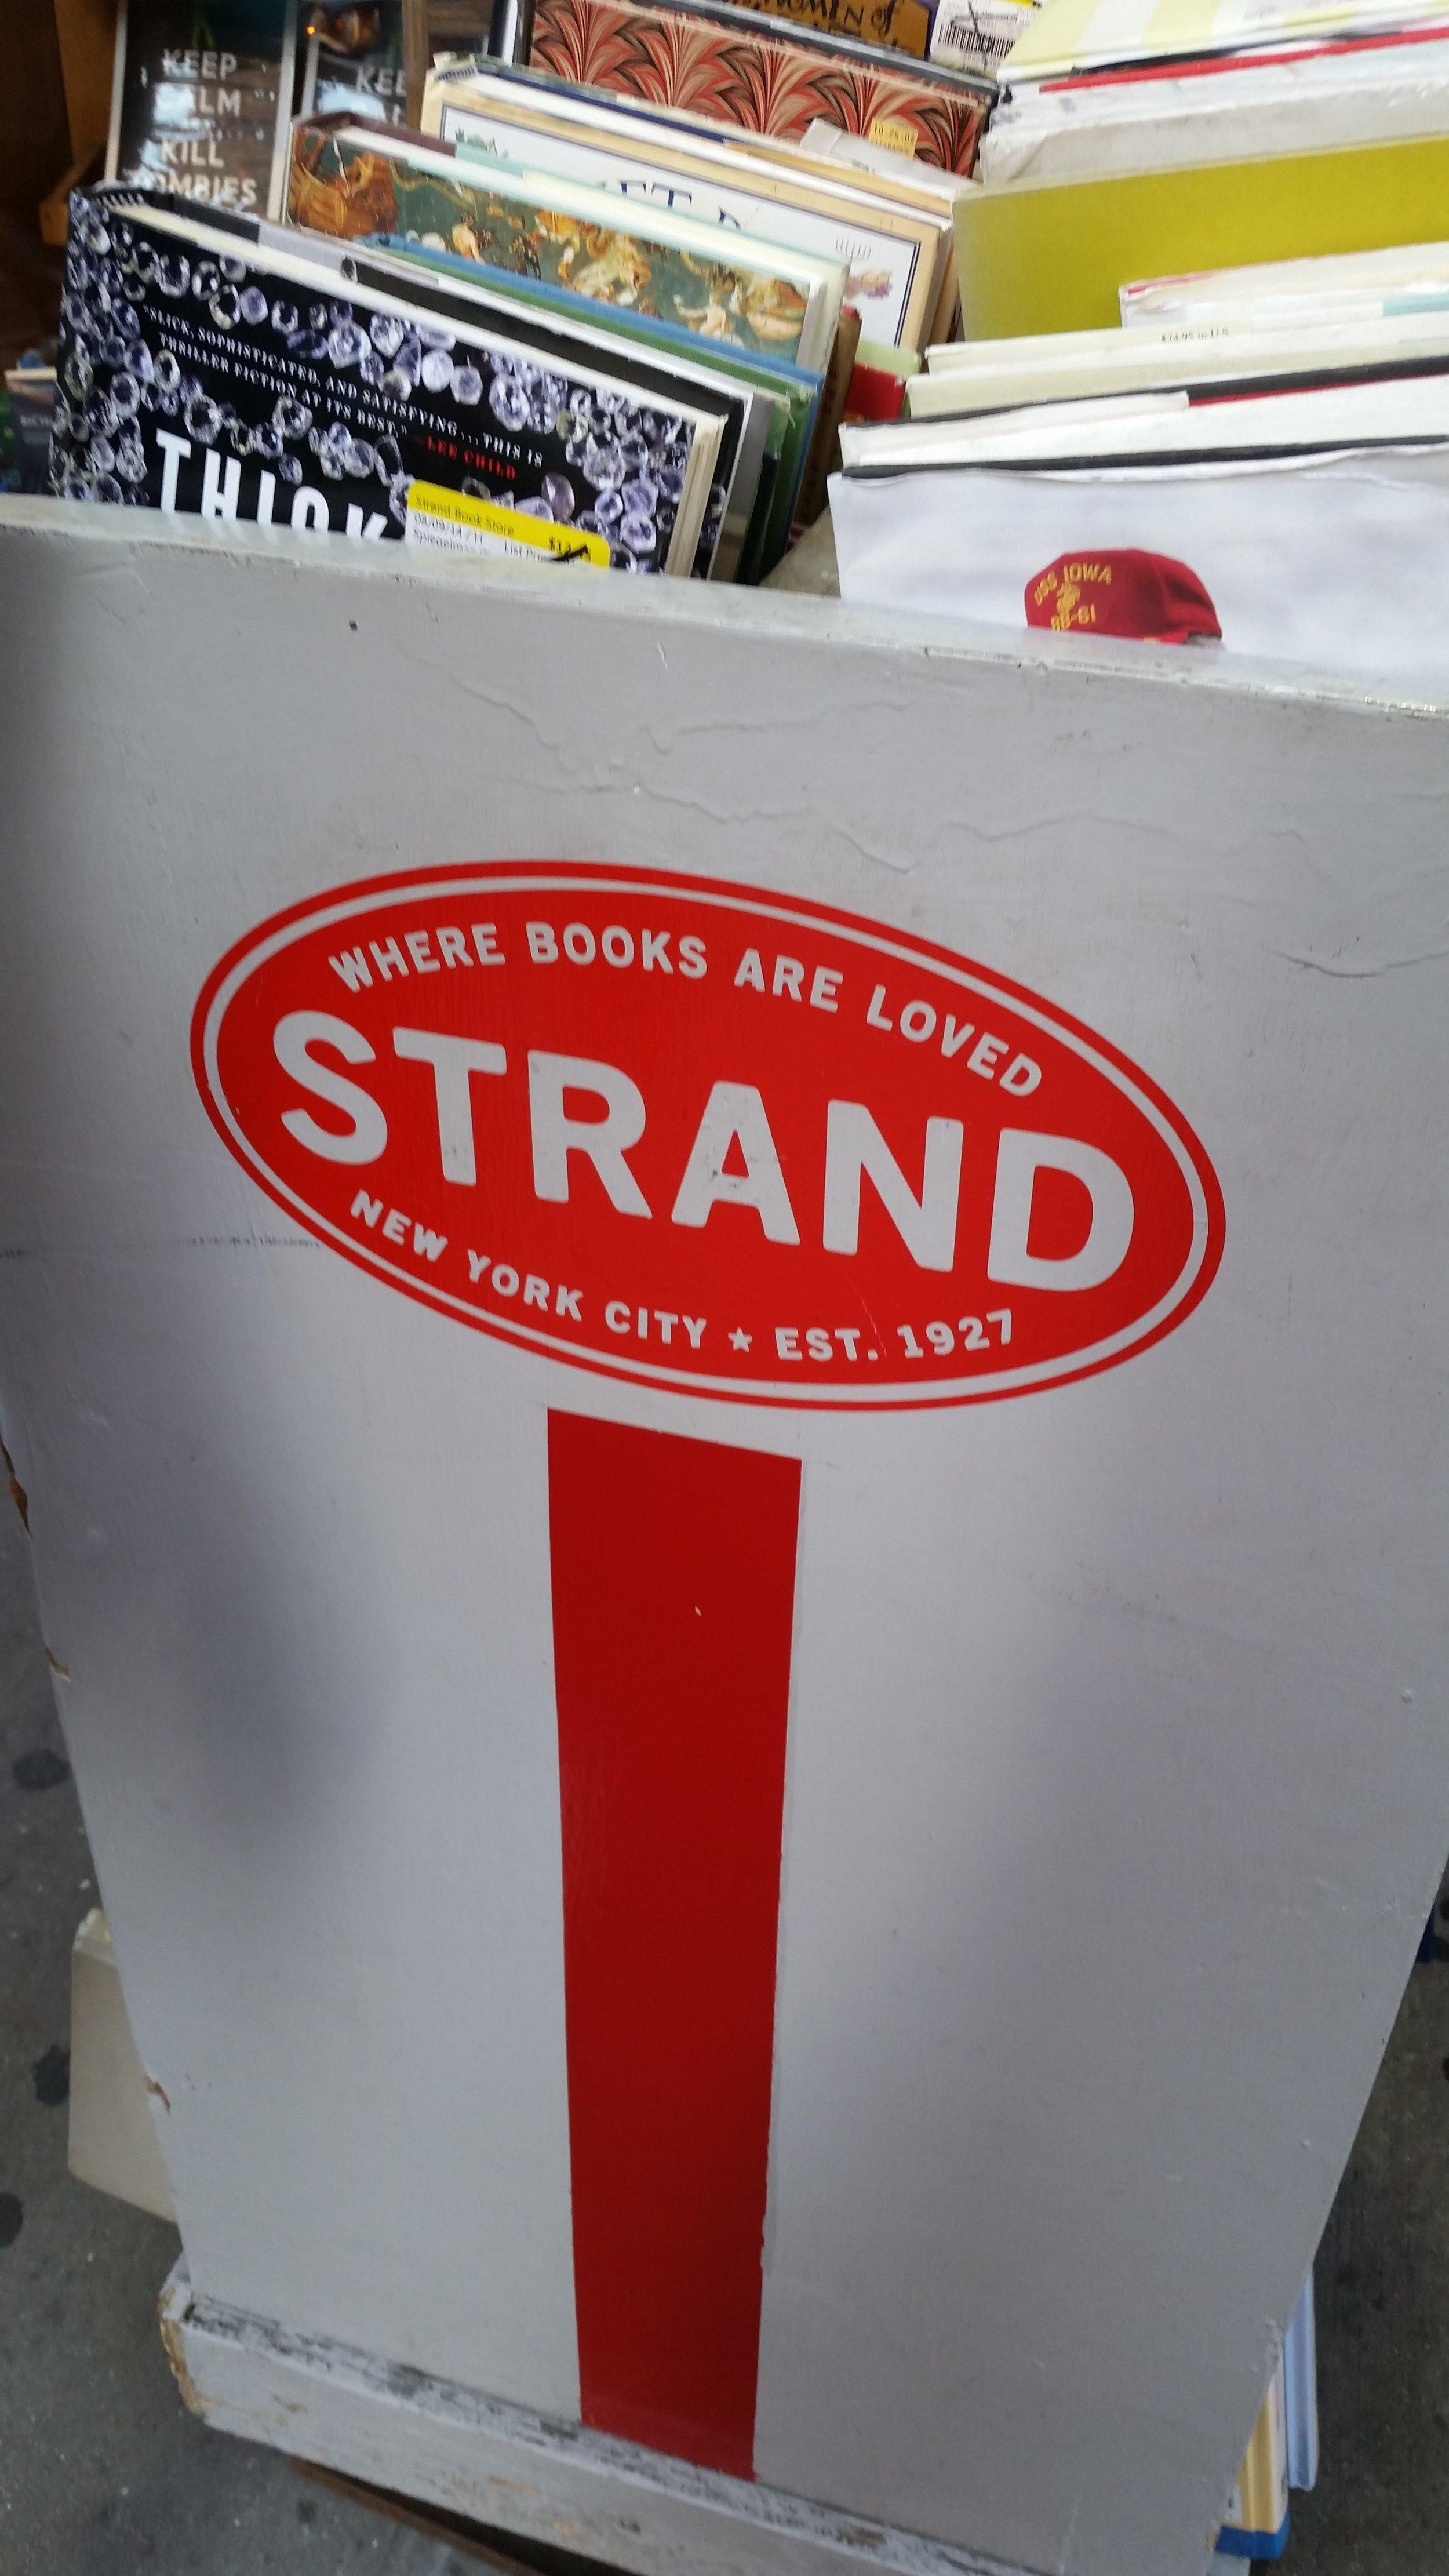 strand bookstore.jpg